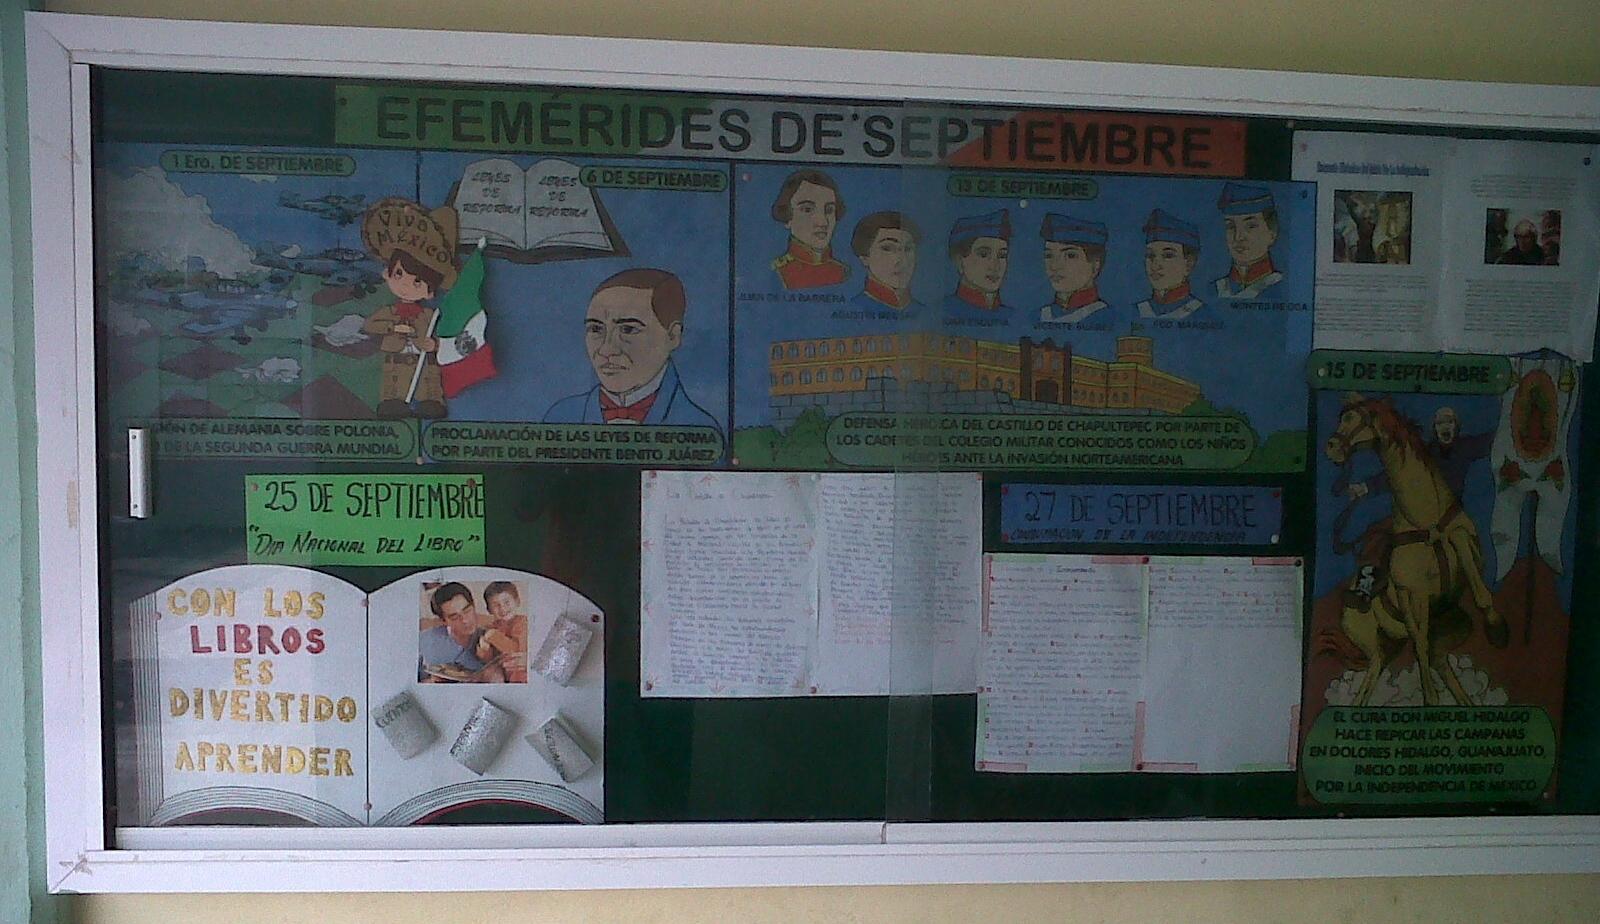 Peri dico mural mes septiembre 10 imagenes educativas for Estructura del periodico mural